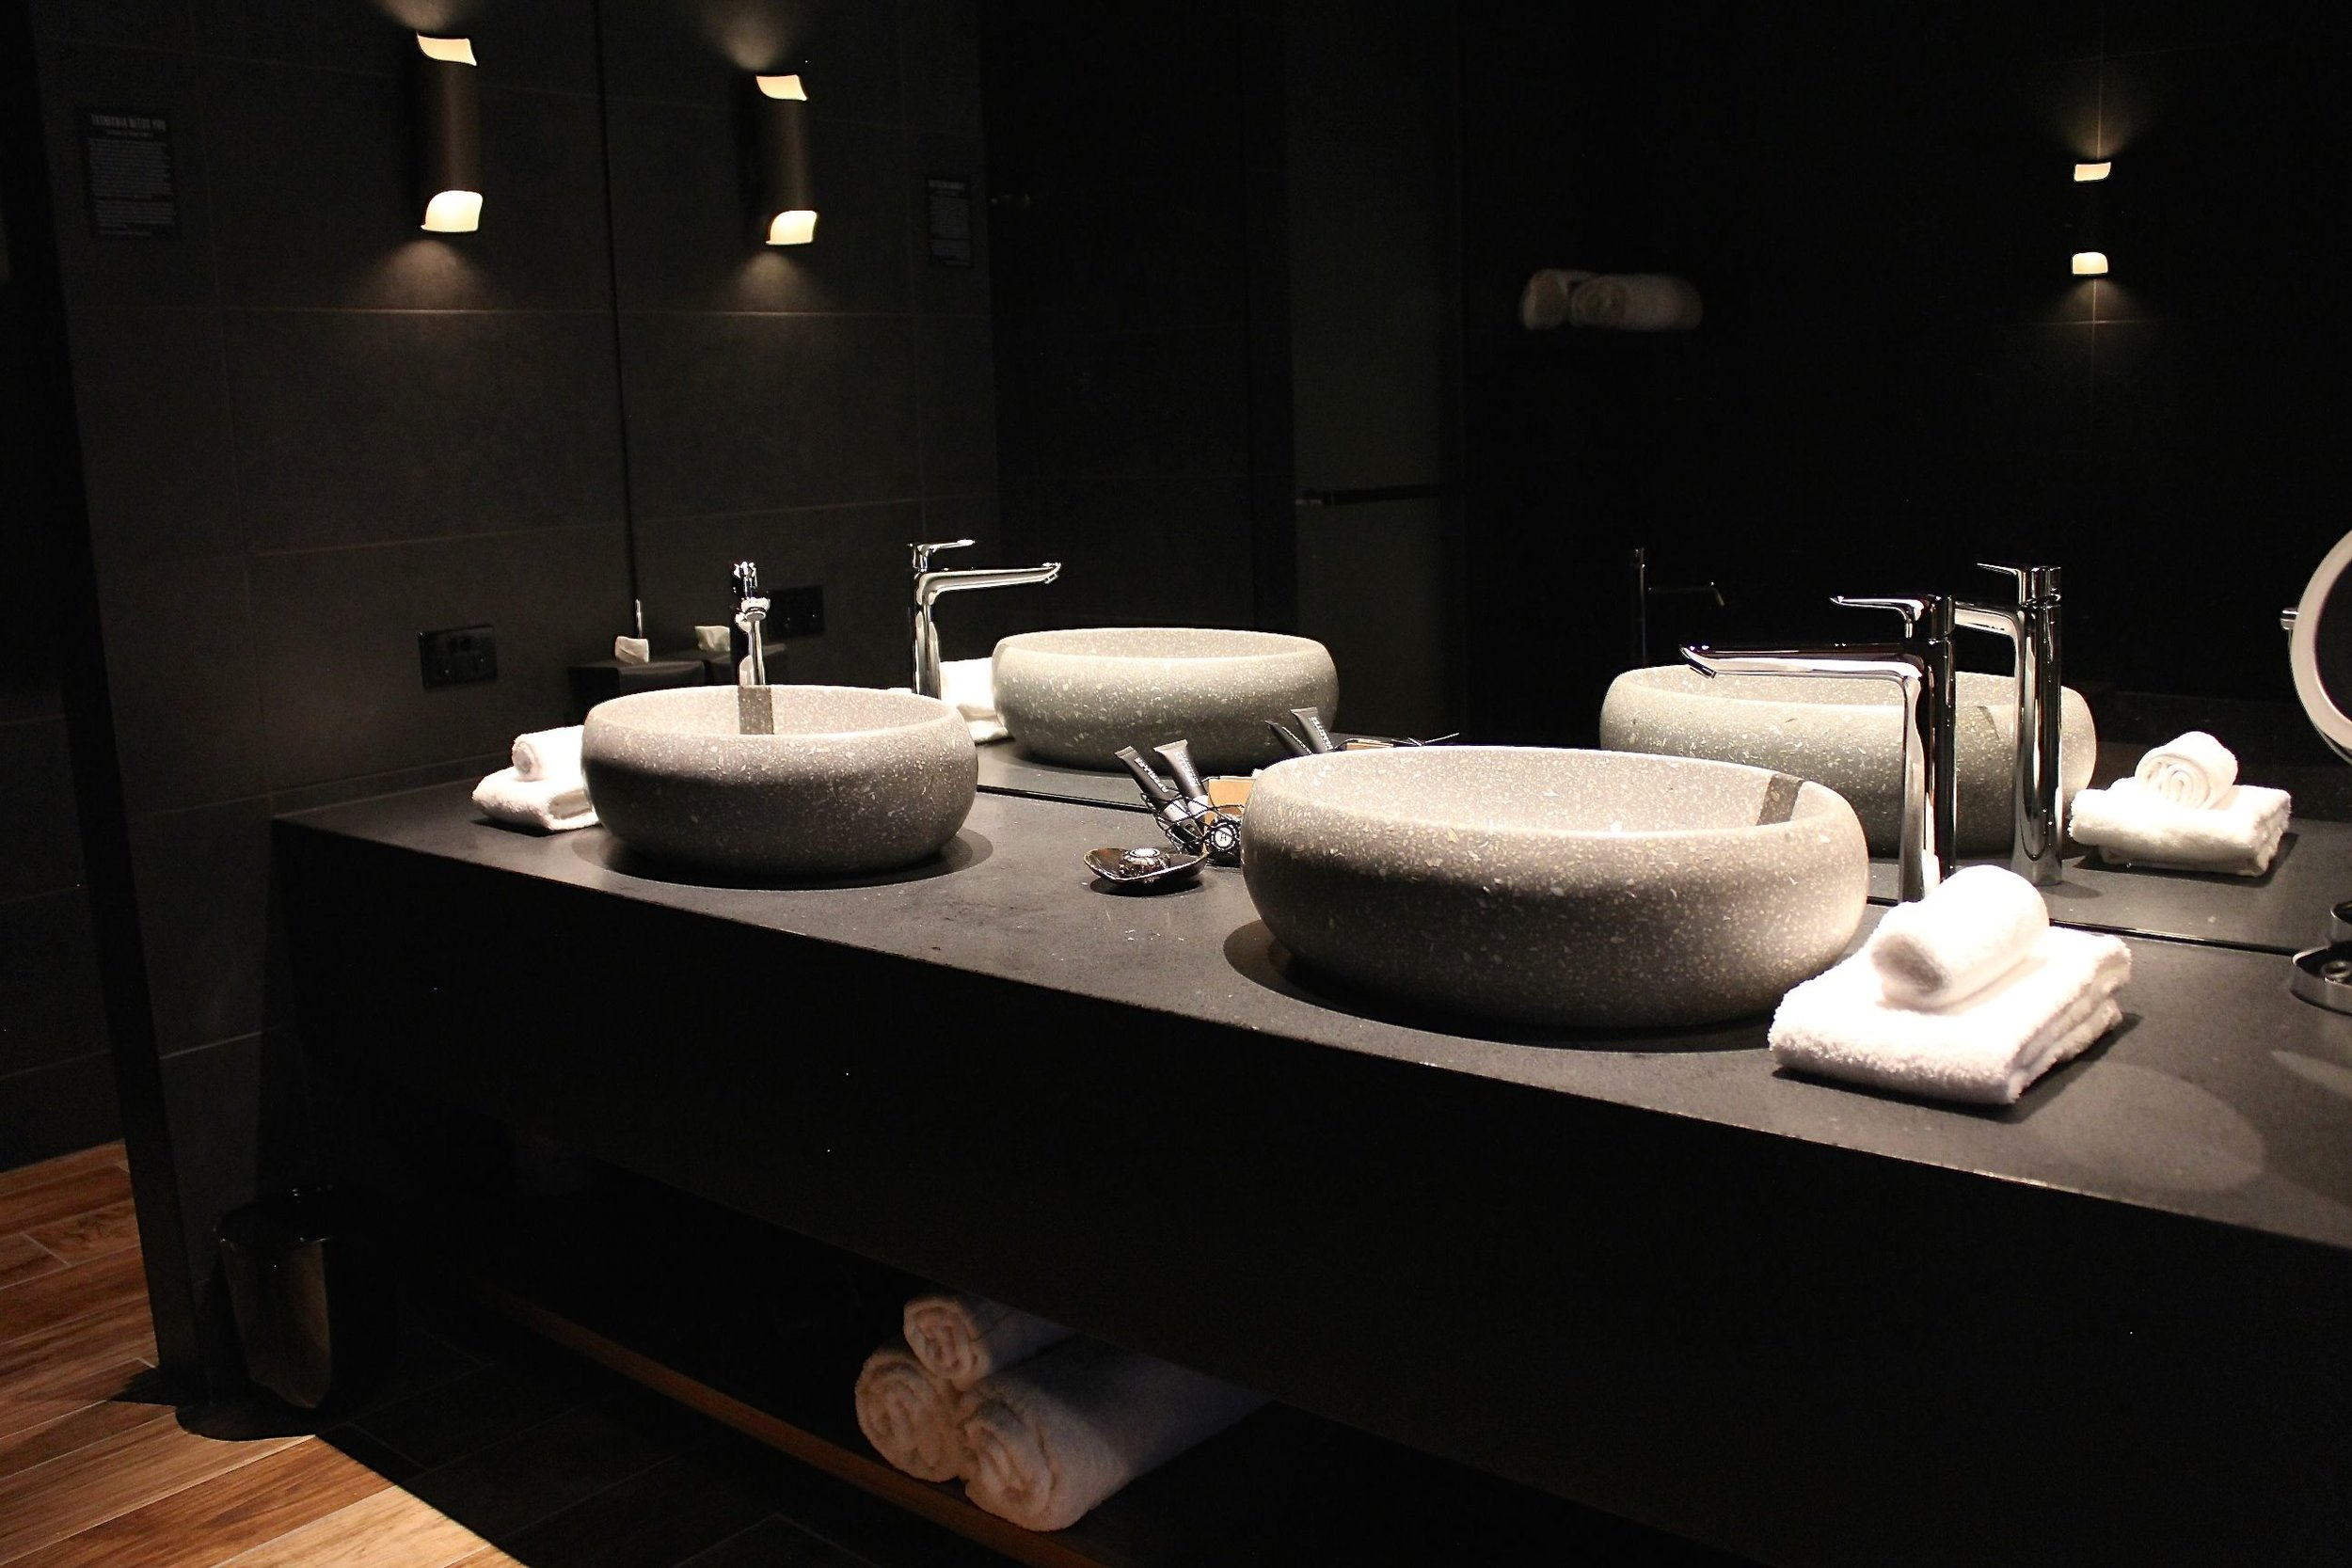 macq01_bathroom